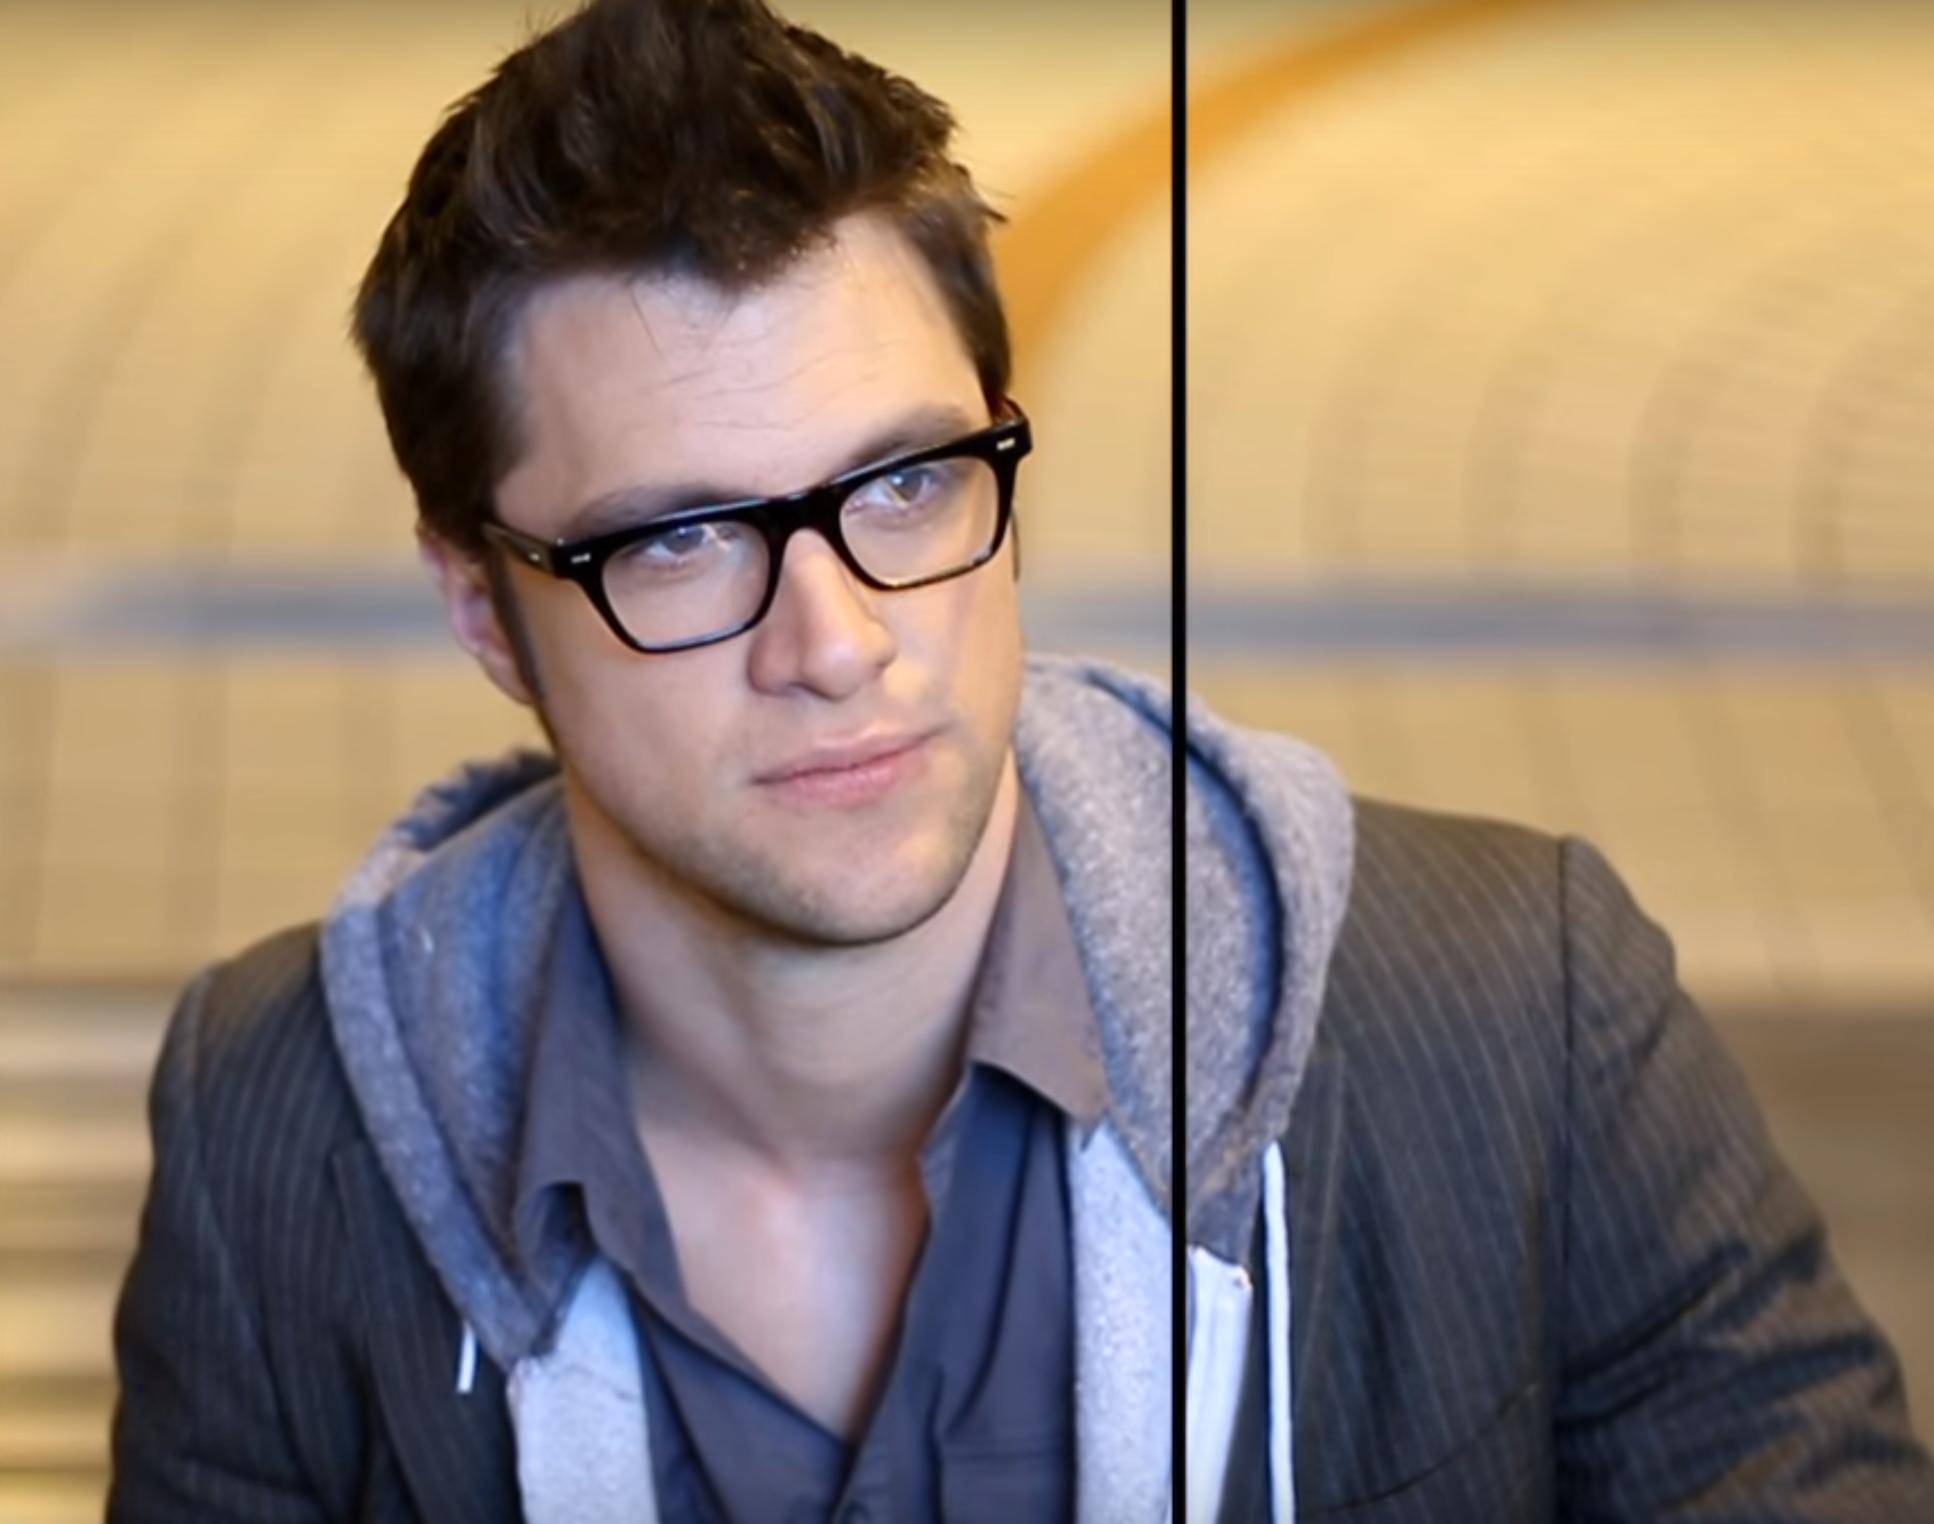 Shane Mcrae From Katharine Mcphee Zachary Levi S Terrified Music Video Zachary Levi Celebrity Crush Handsome Men